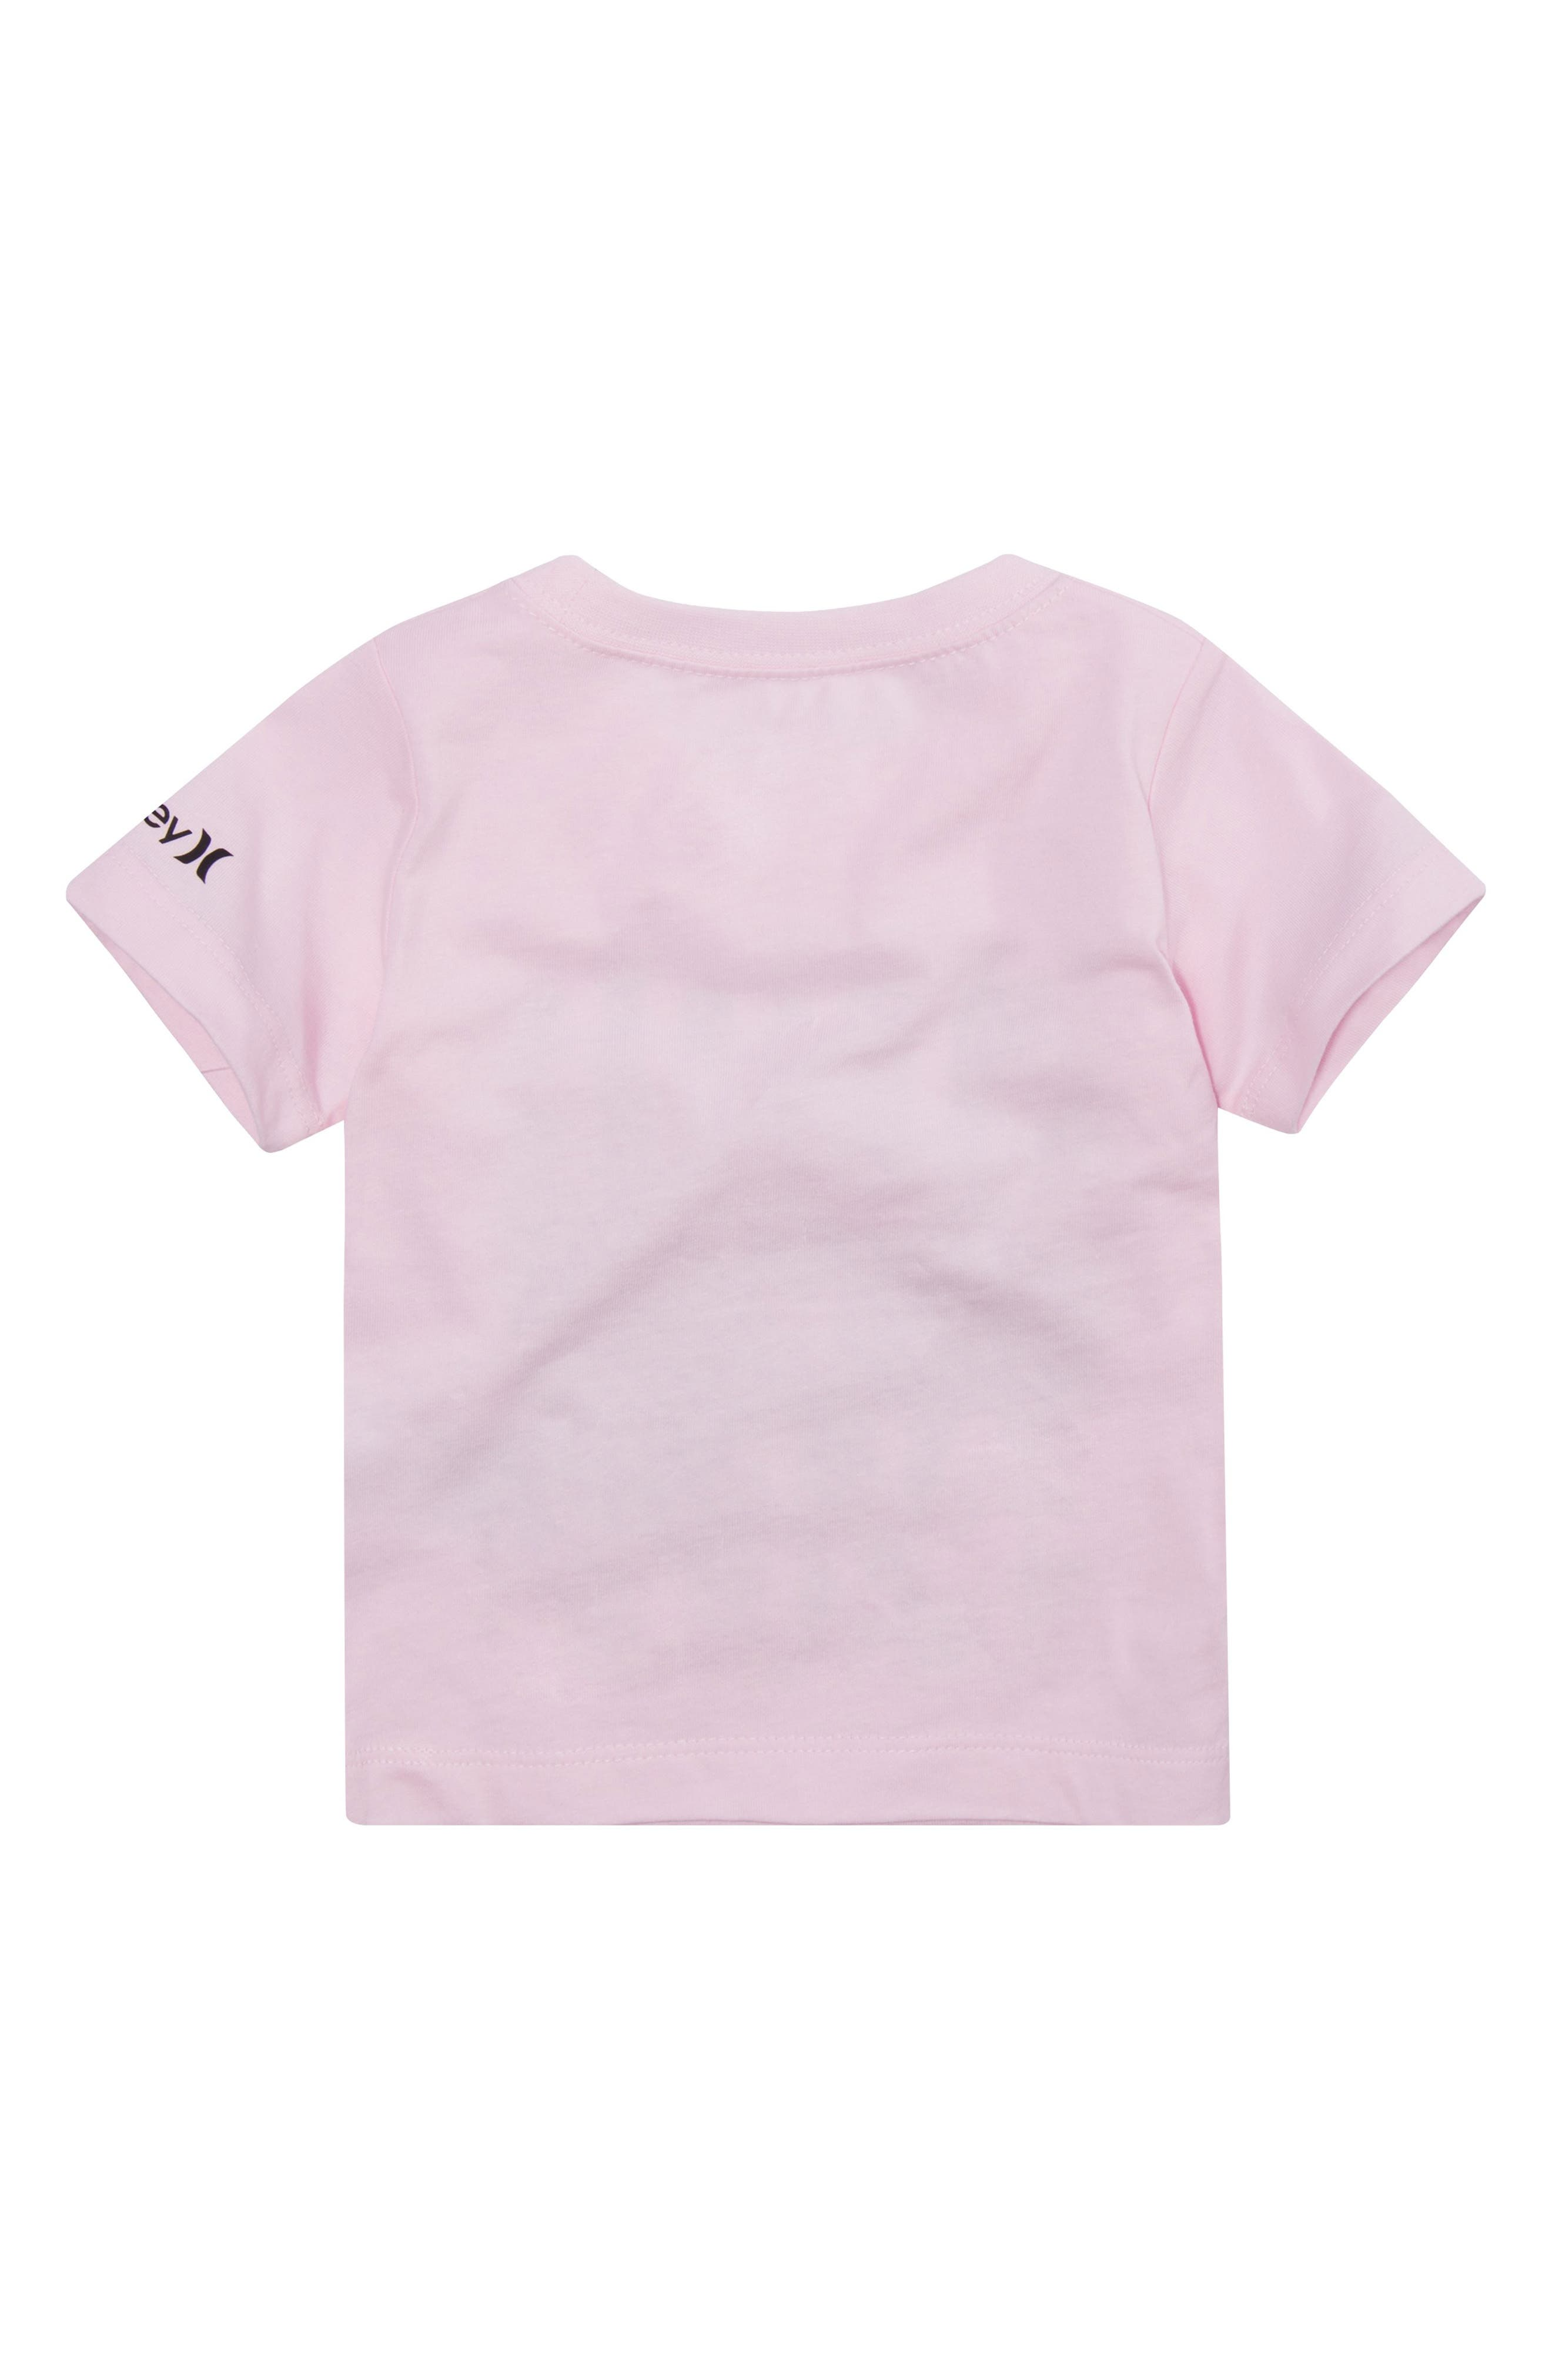 Surf & Enjoy Graphic T-Shirt,                             Alternate thumbnail 2, color,                             Artic Pink